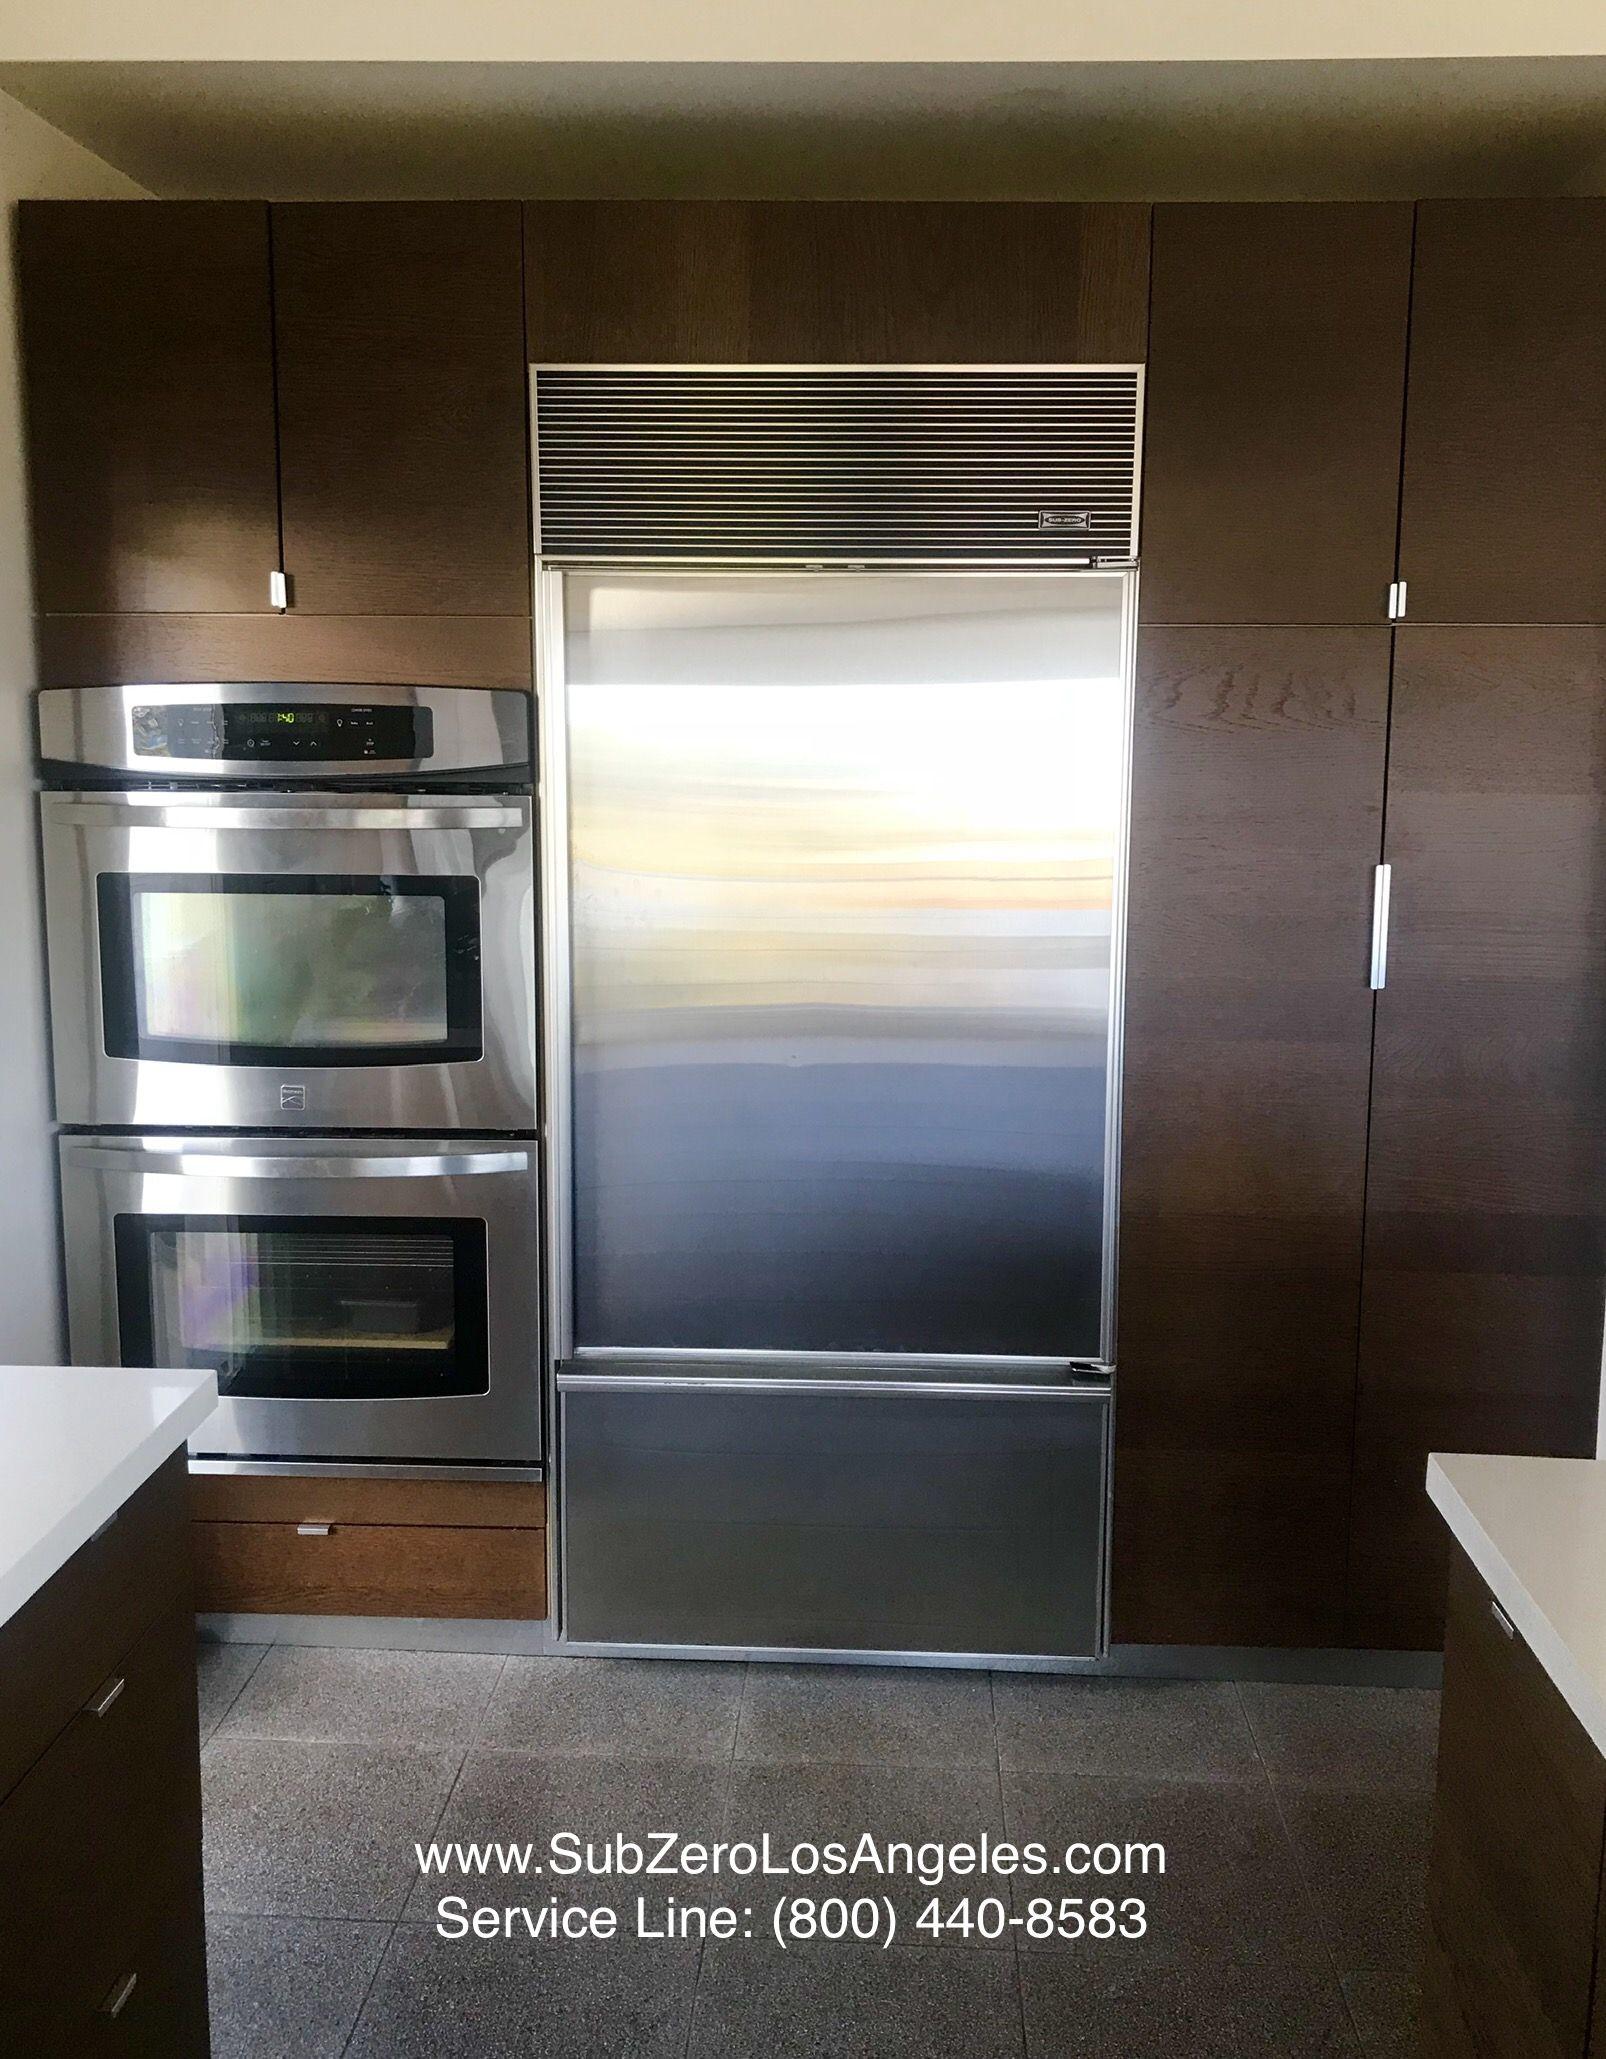 Subzerowolf Subzerorefrigerator Subzerorepair Beverlyhills